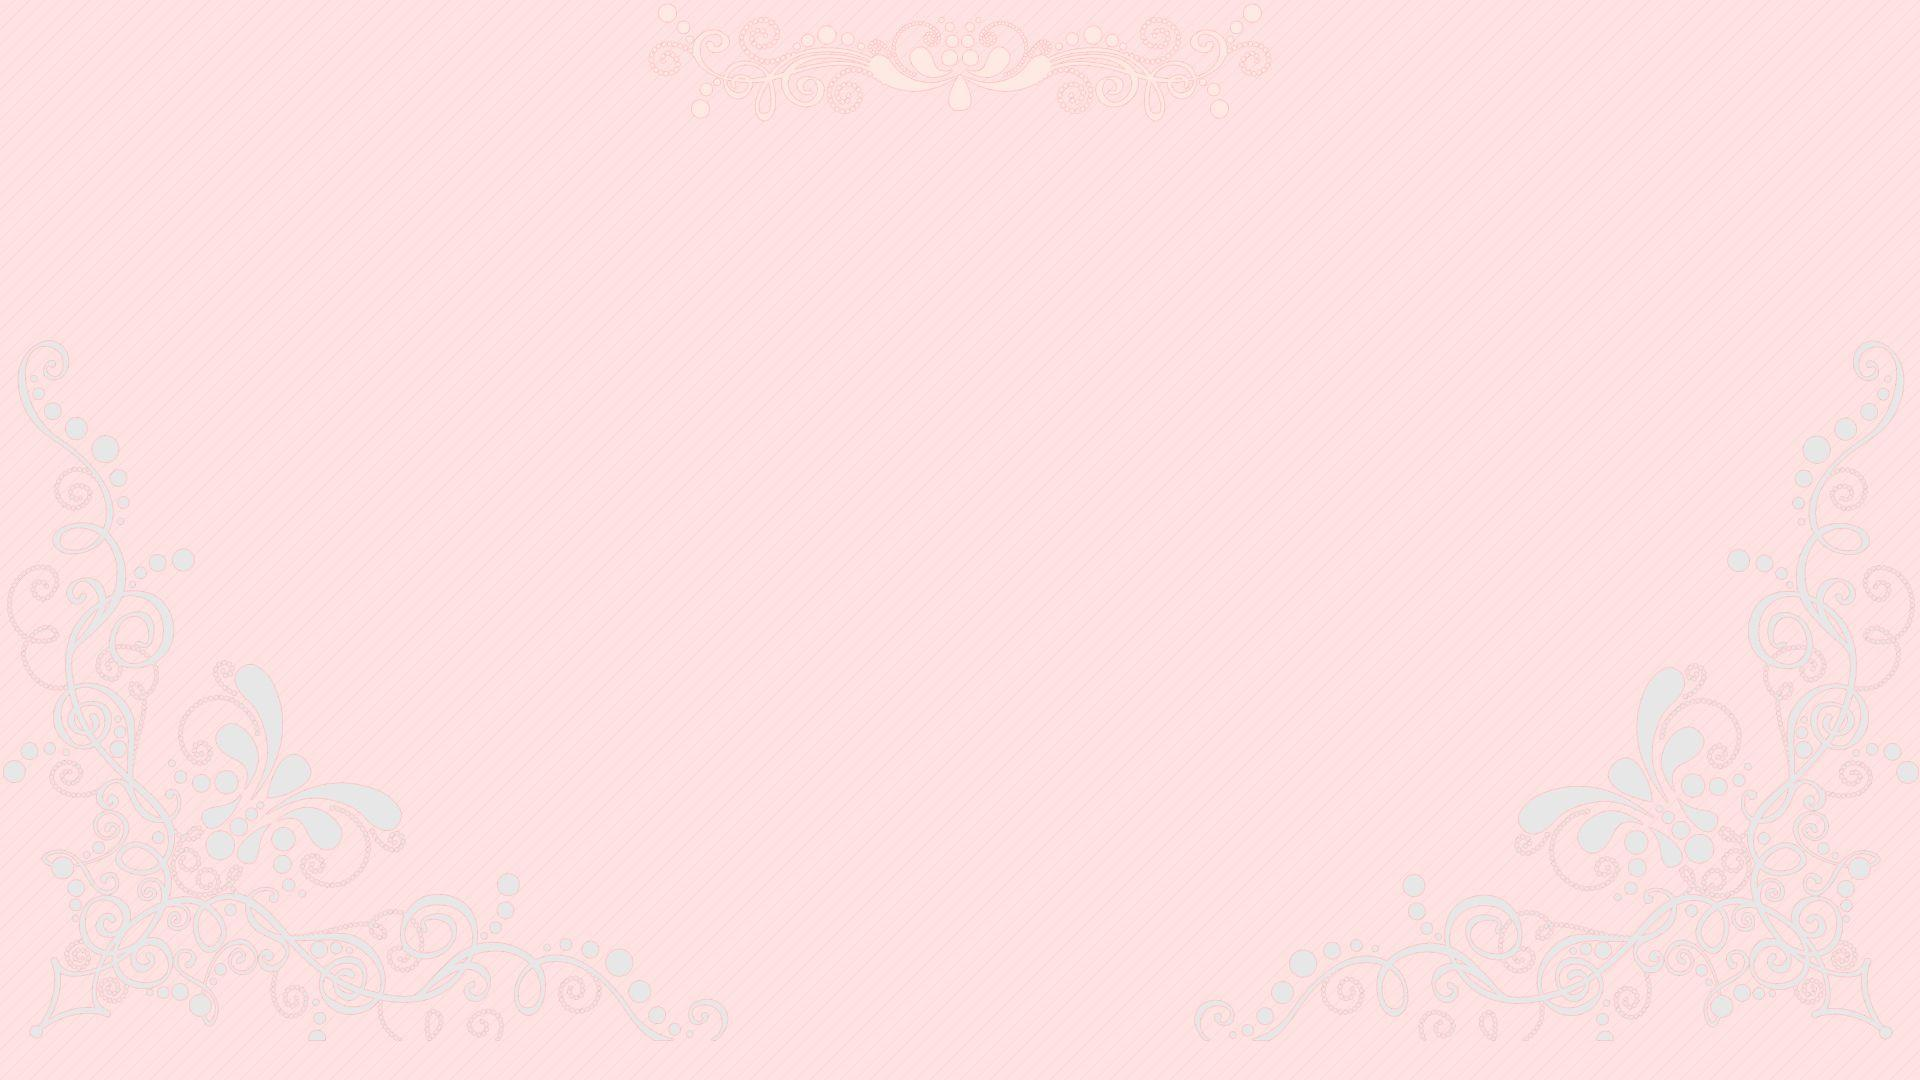 Pastel Pink Desktop Wallpapers Wallpaper Cave